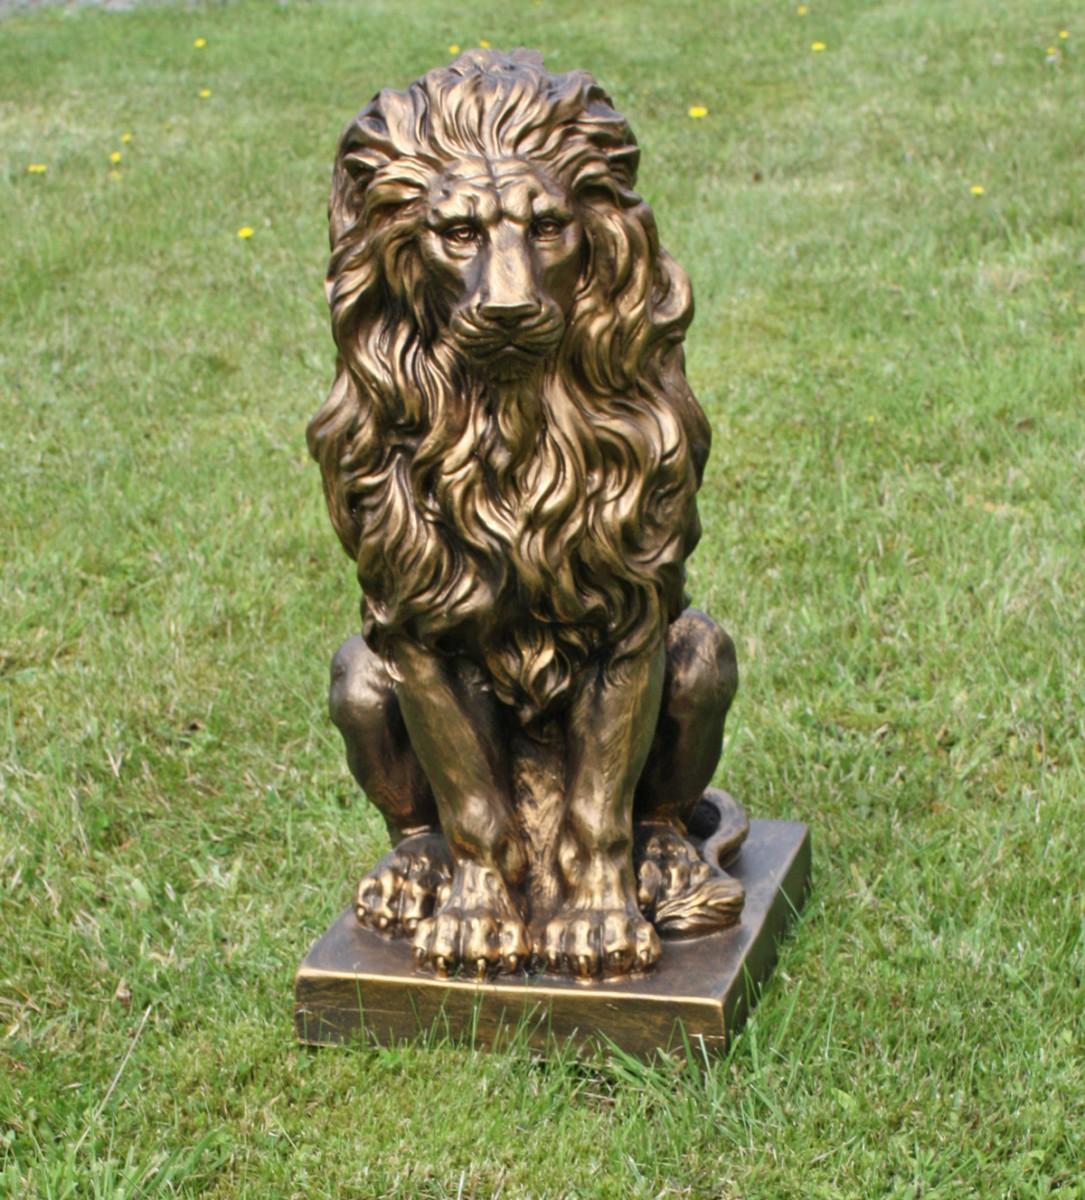 sitzender l we gold 57x27x38cm statue skulptur deko gartenfigur ebay. Black Bedroom Furniture Sets. Home Design Ideas